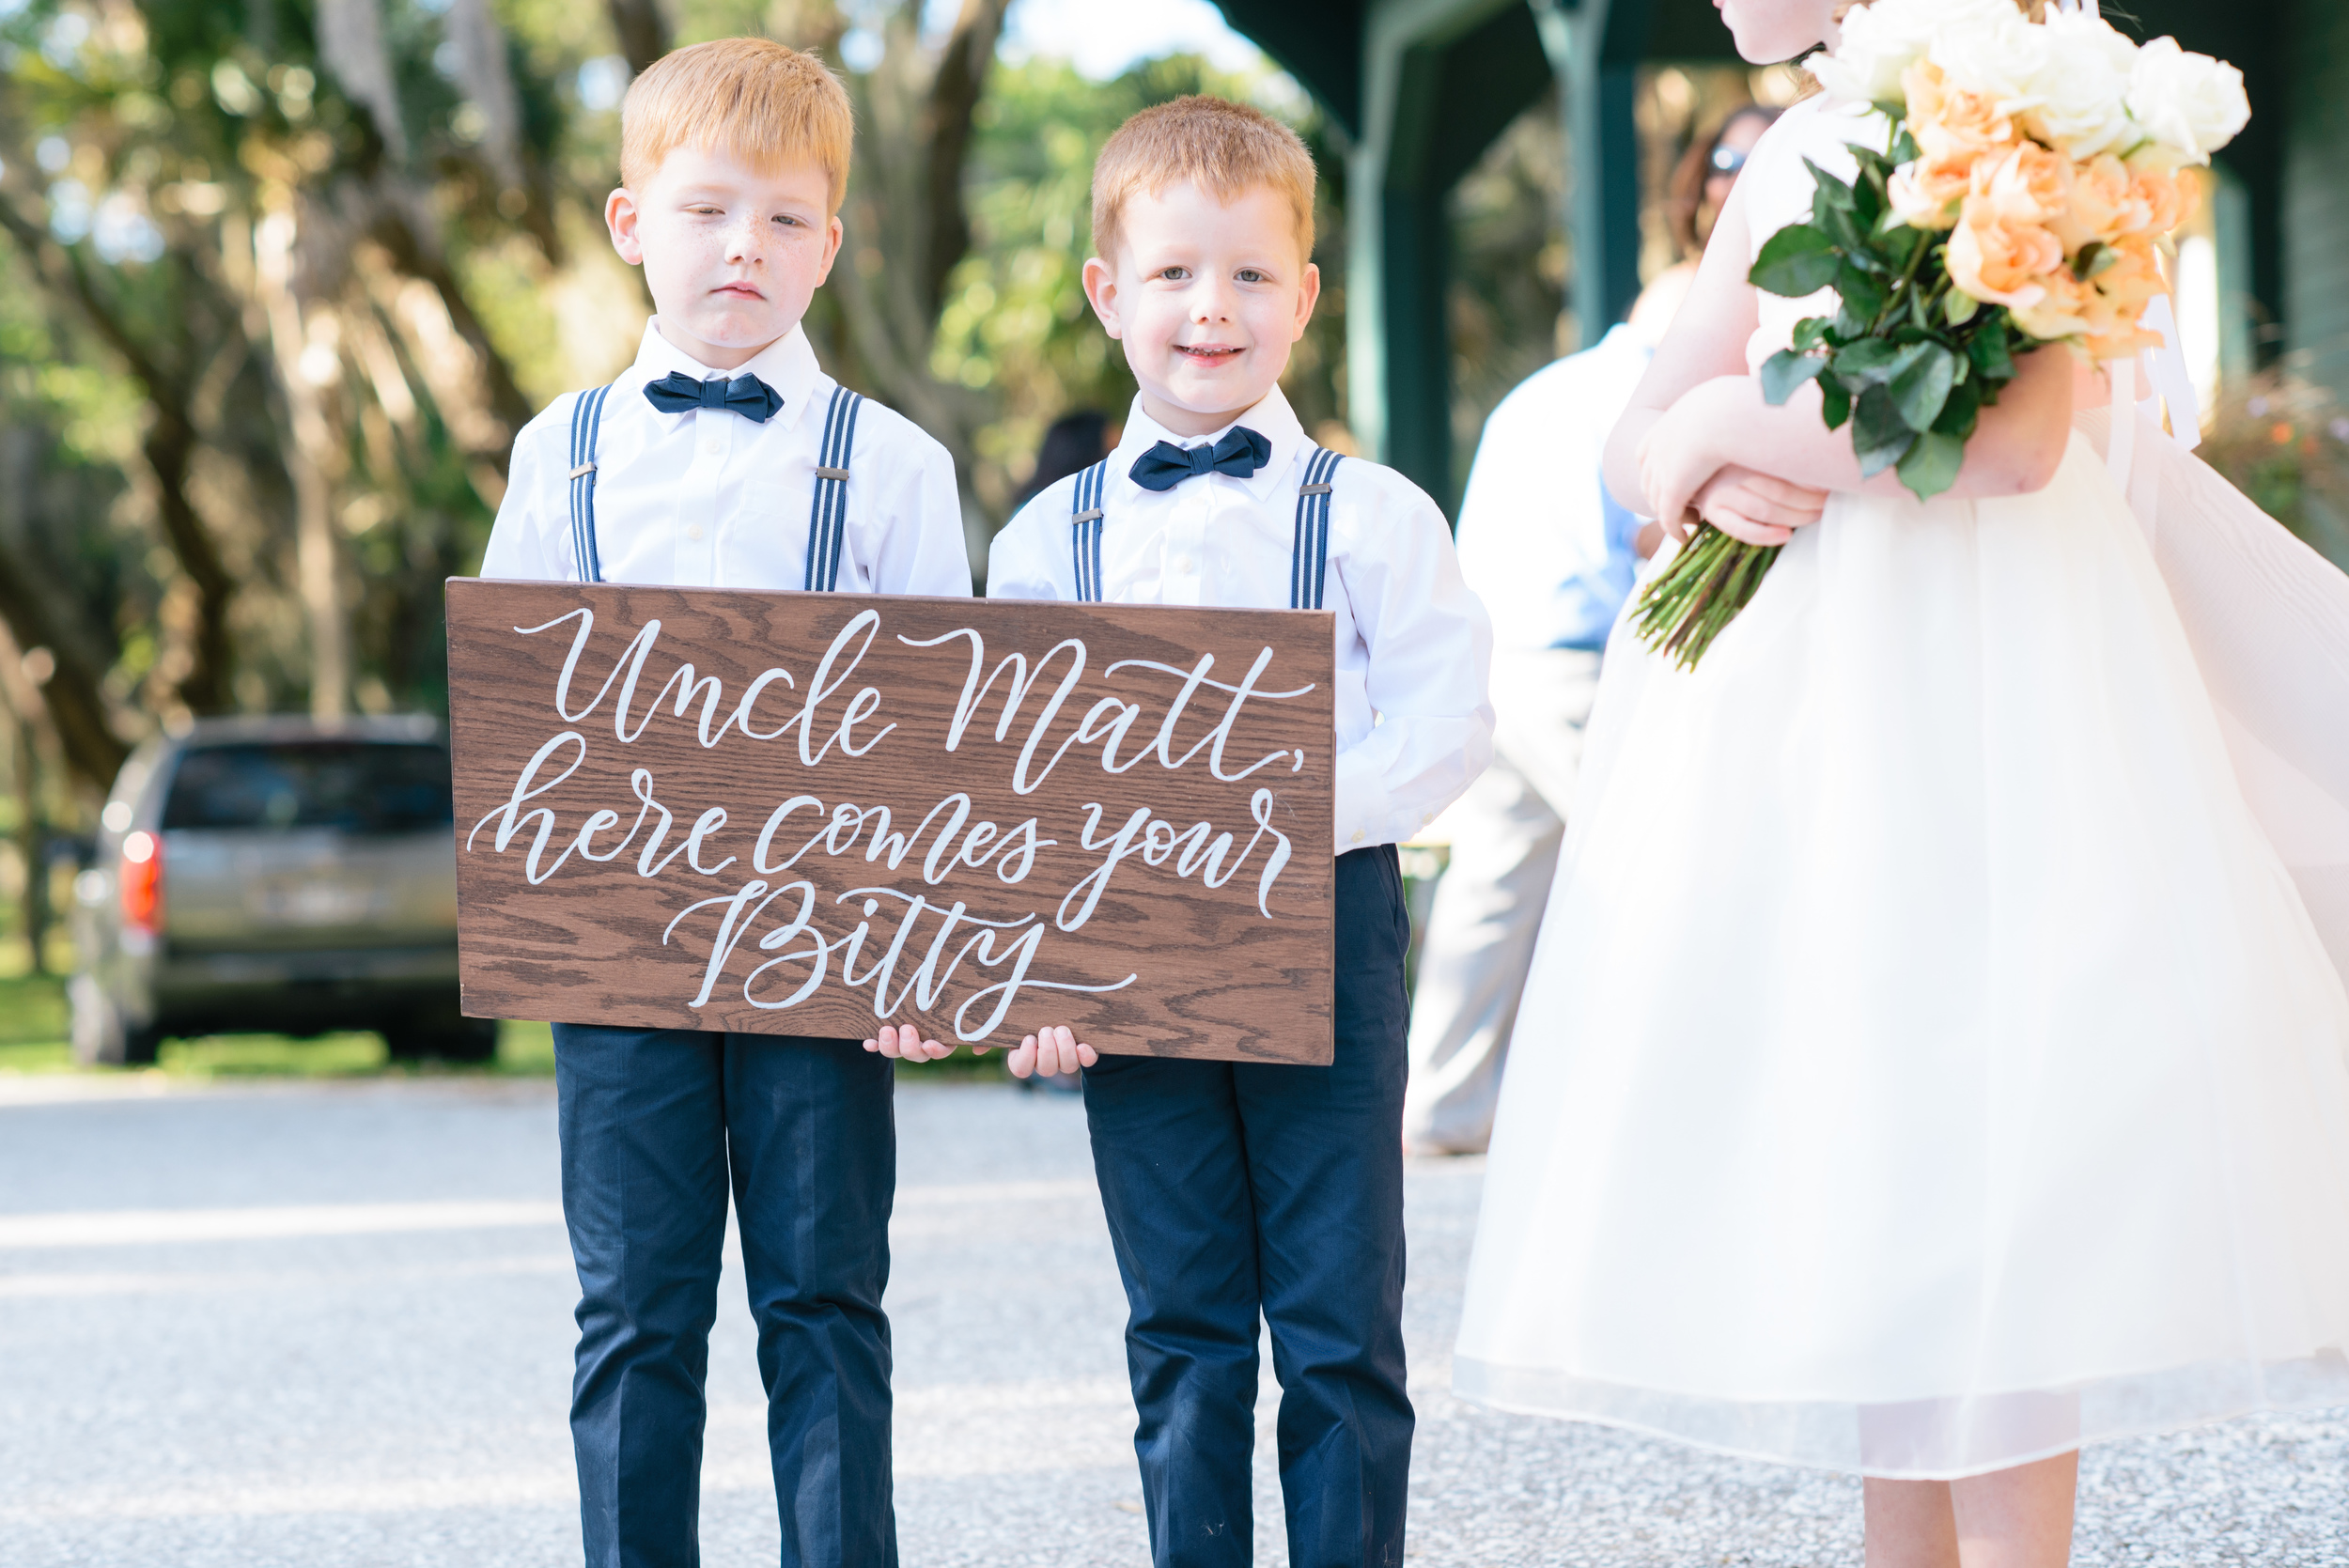 kadi-and-matt-carroll-april-9-2016-jekyl-island-wedding-m-newsom-photography- (432 of 744).jpg